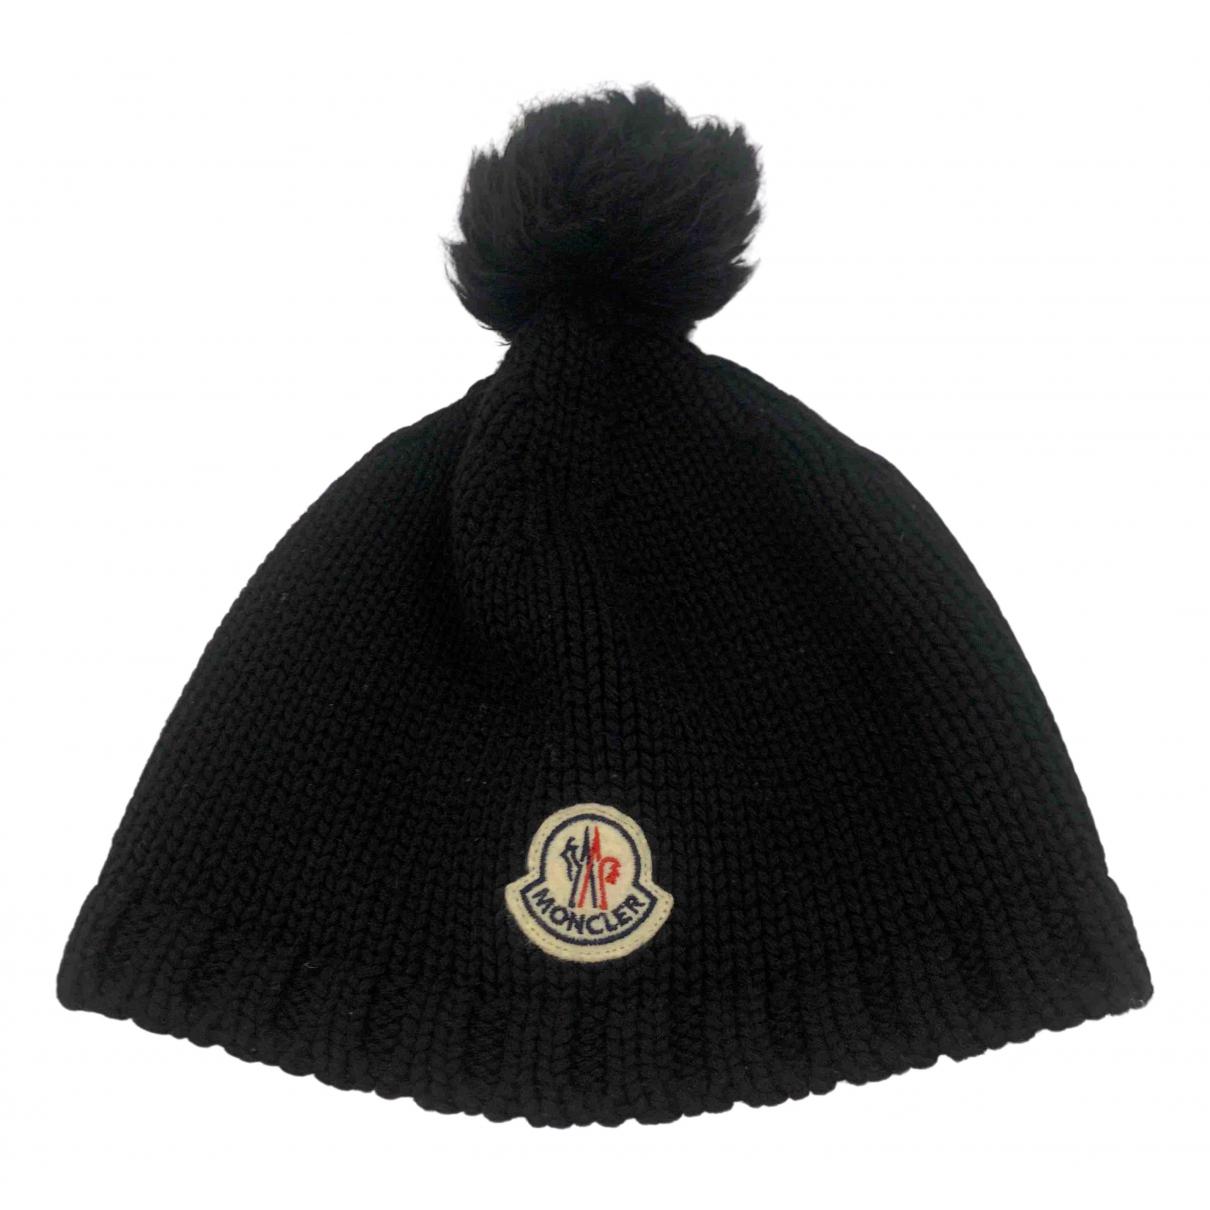 Moncler N Black Wool hat & pull on hat for Men M International